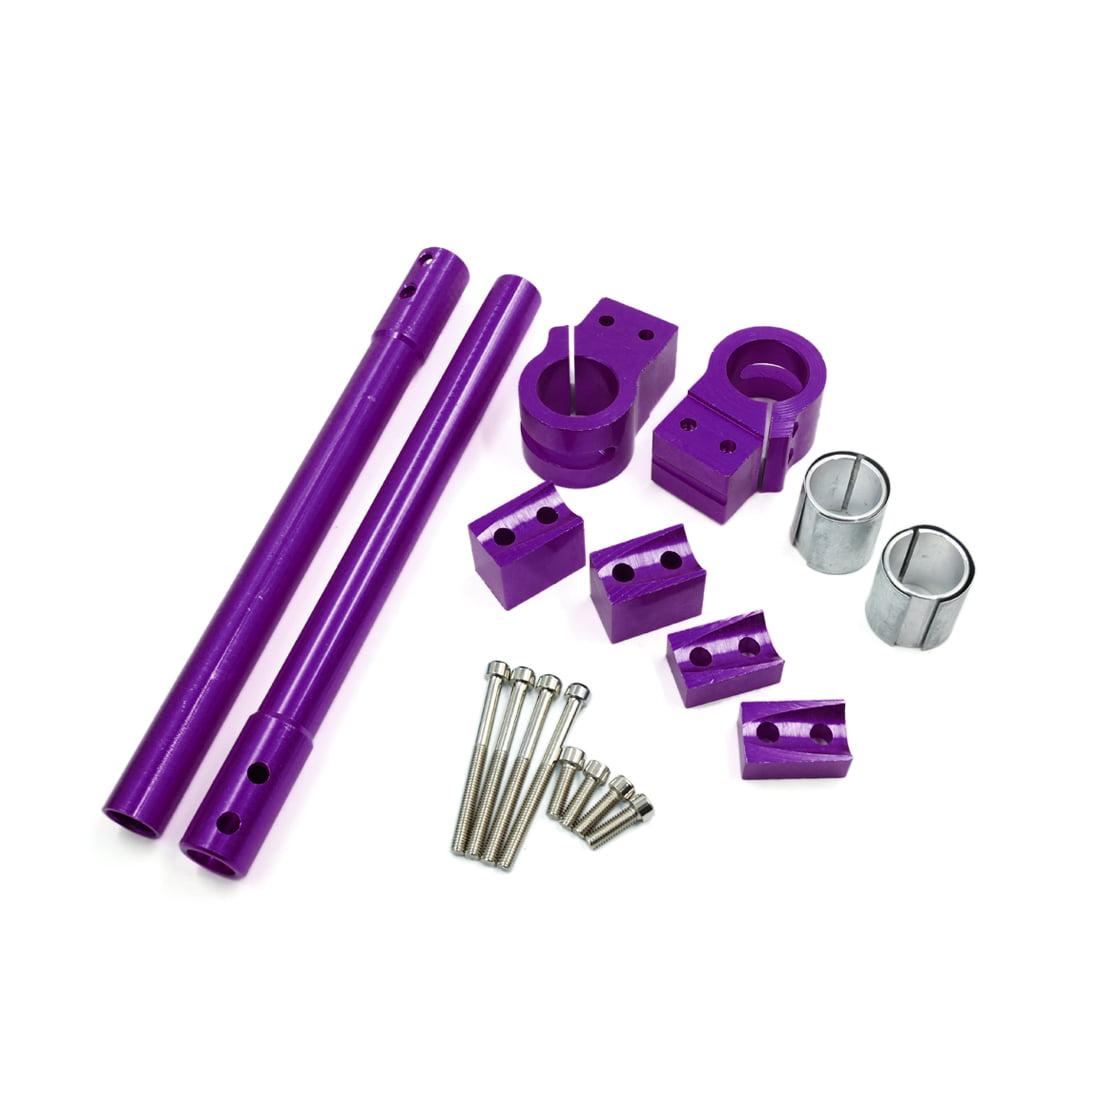 2Pcs Purple Metal Handlebar Separate Handle Grip Set for Motorcycle